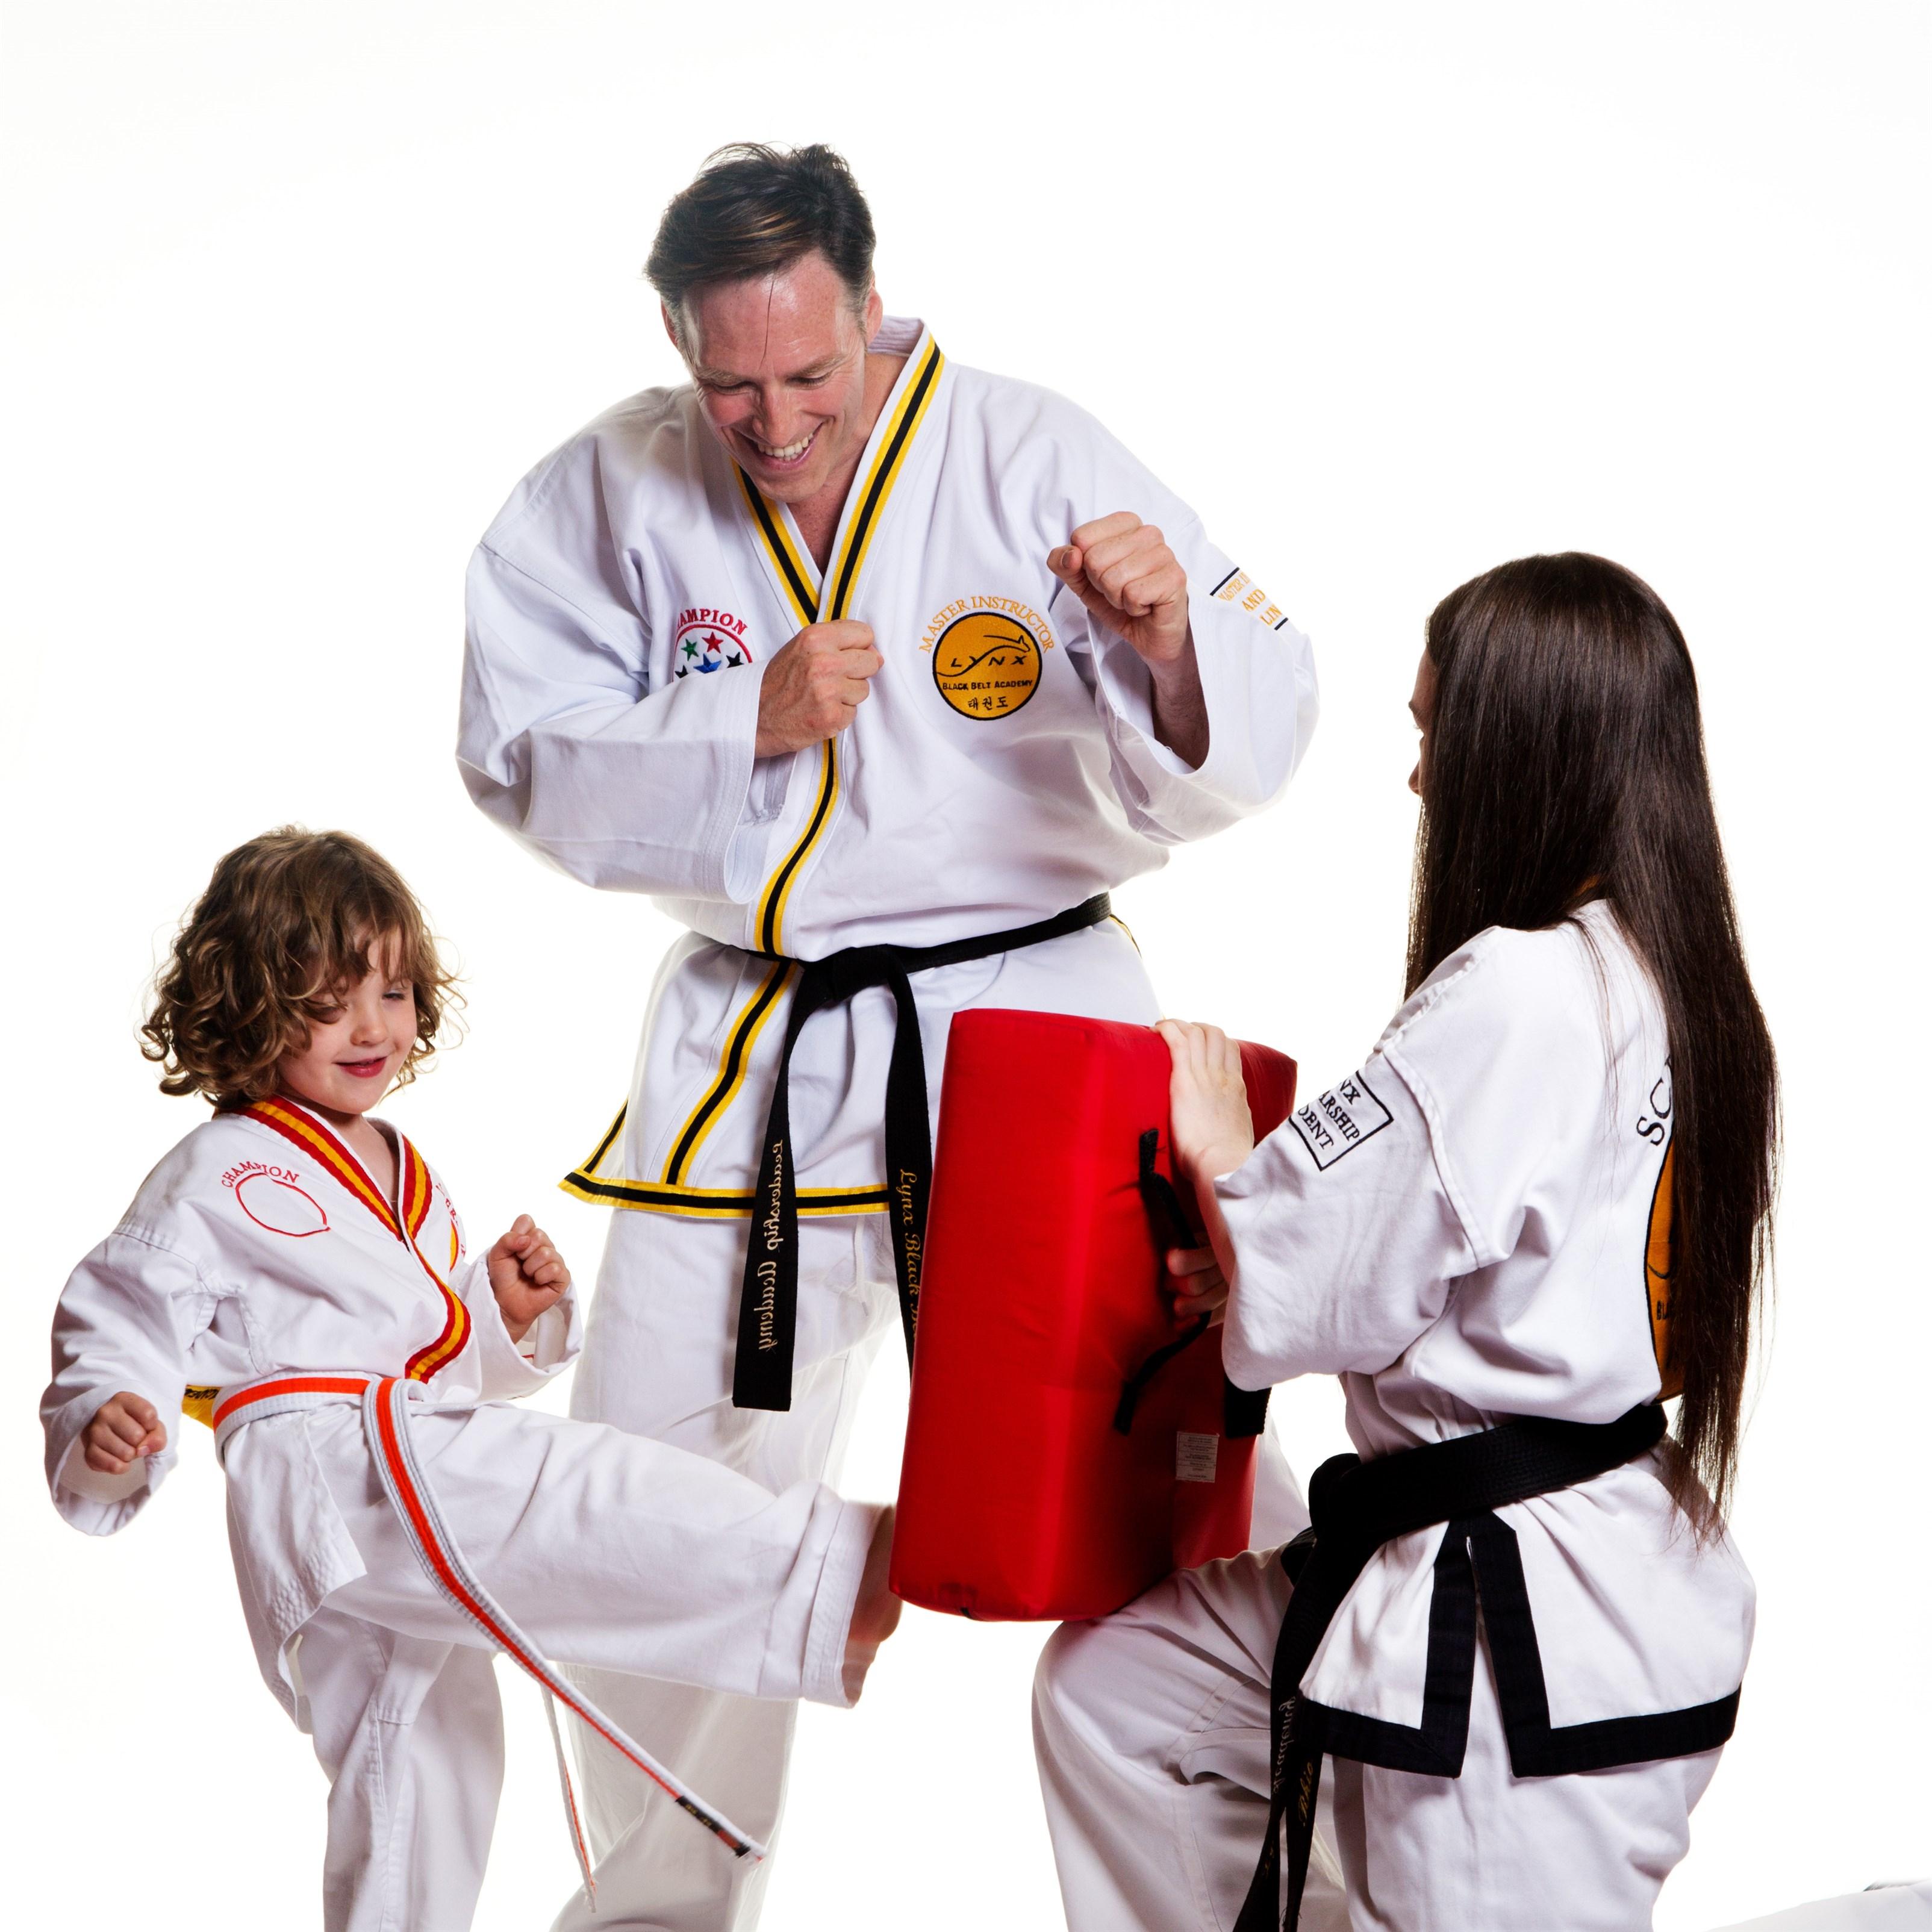 Children's Program at Lynx Black Belt Leadership Academy, Retford